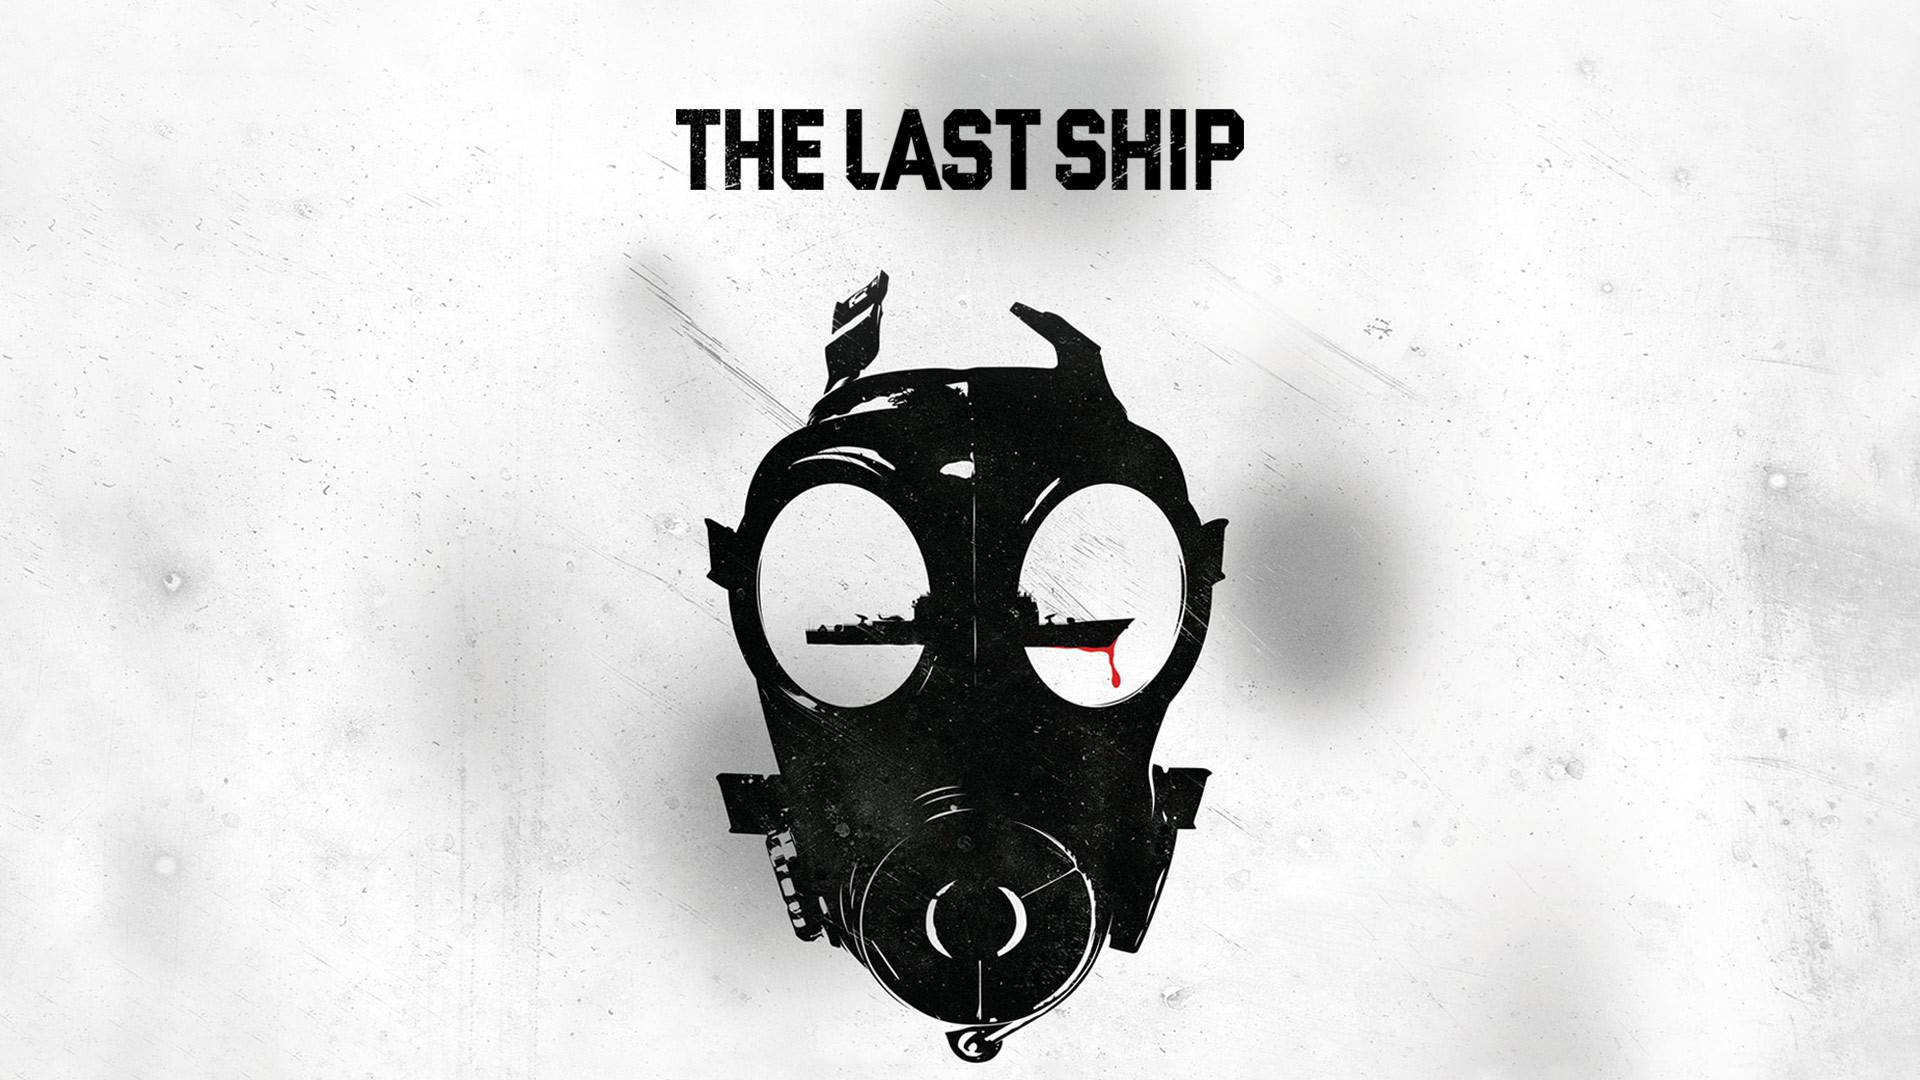 The Last Ship Season 1